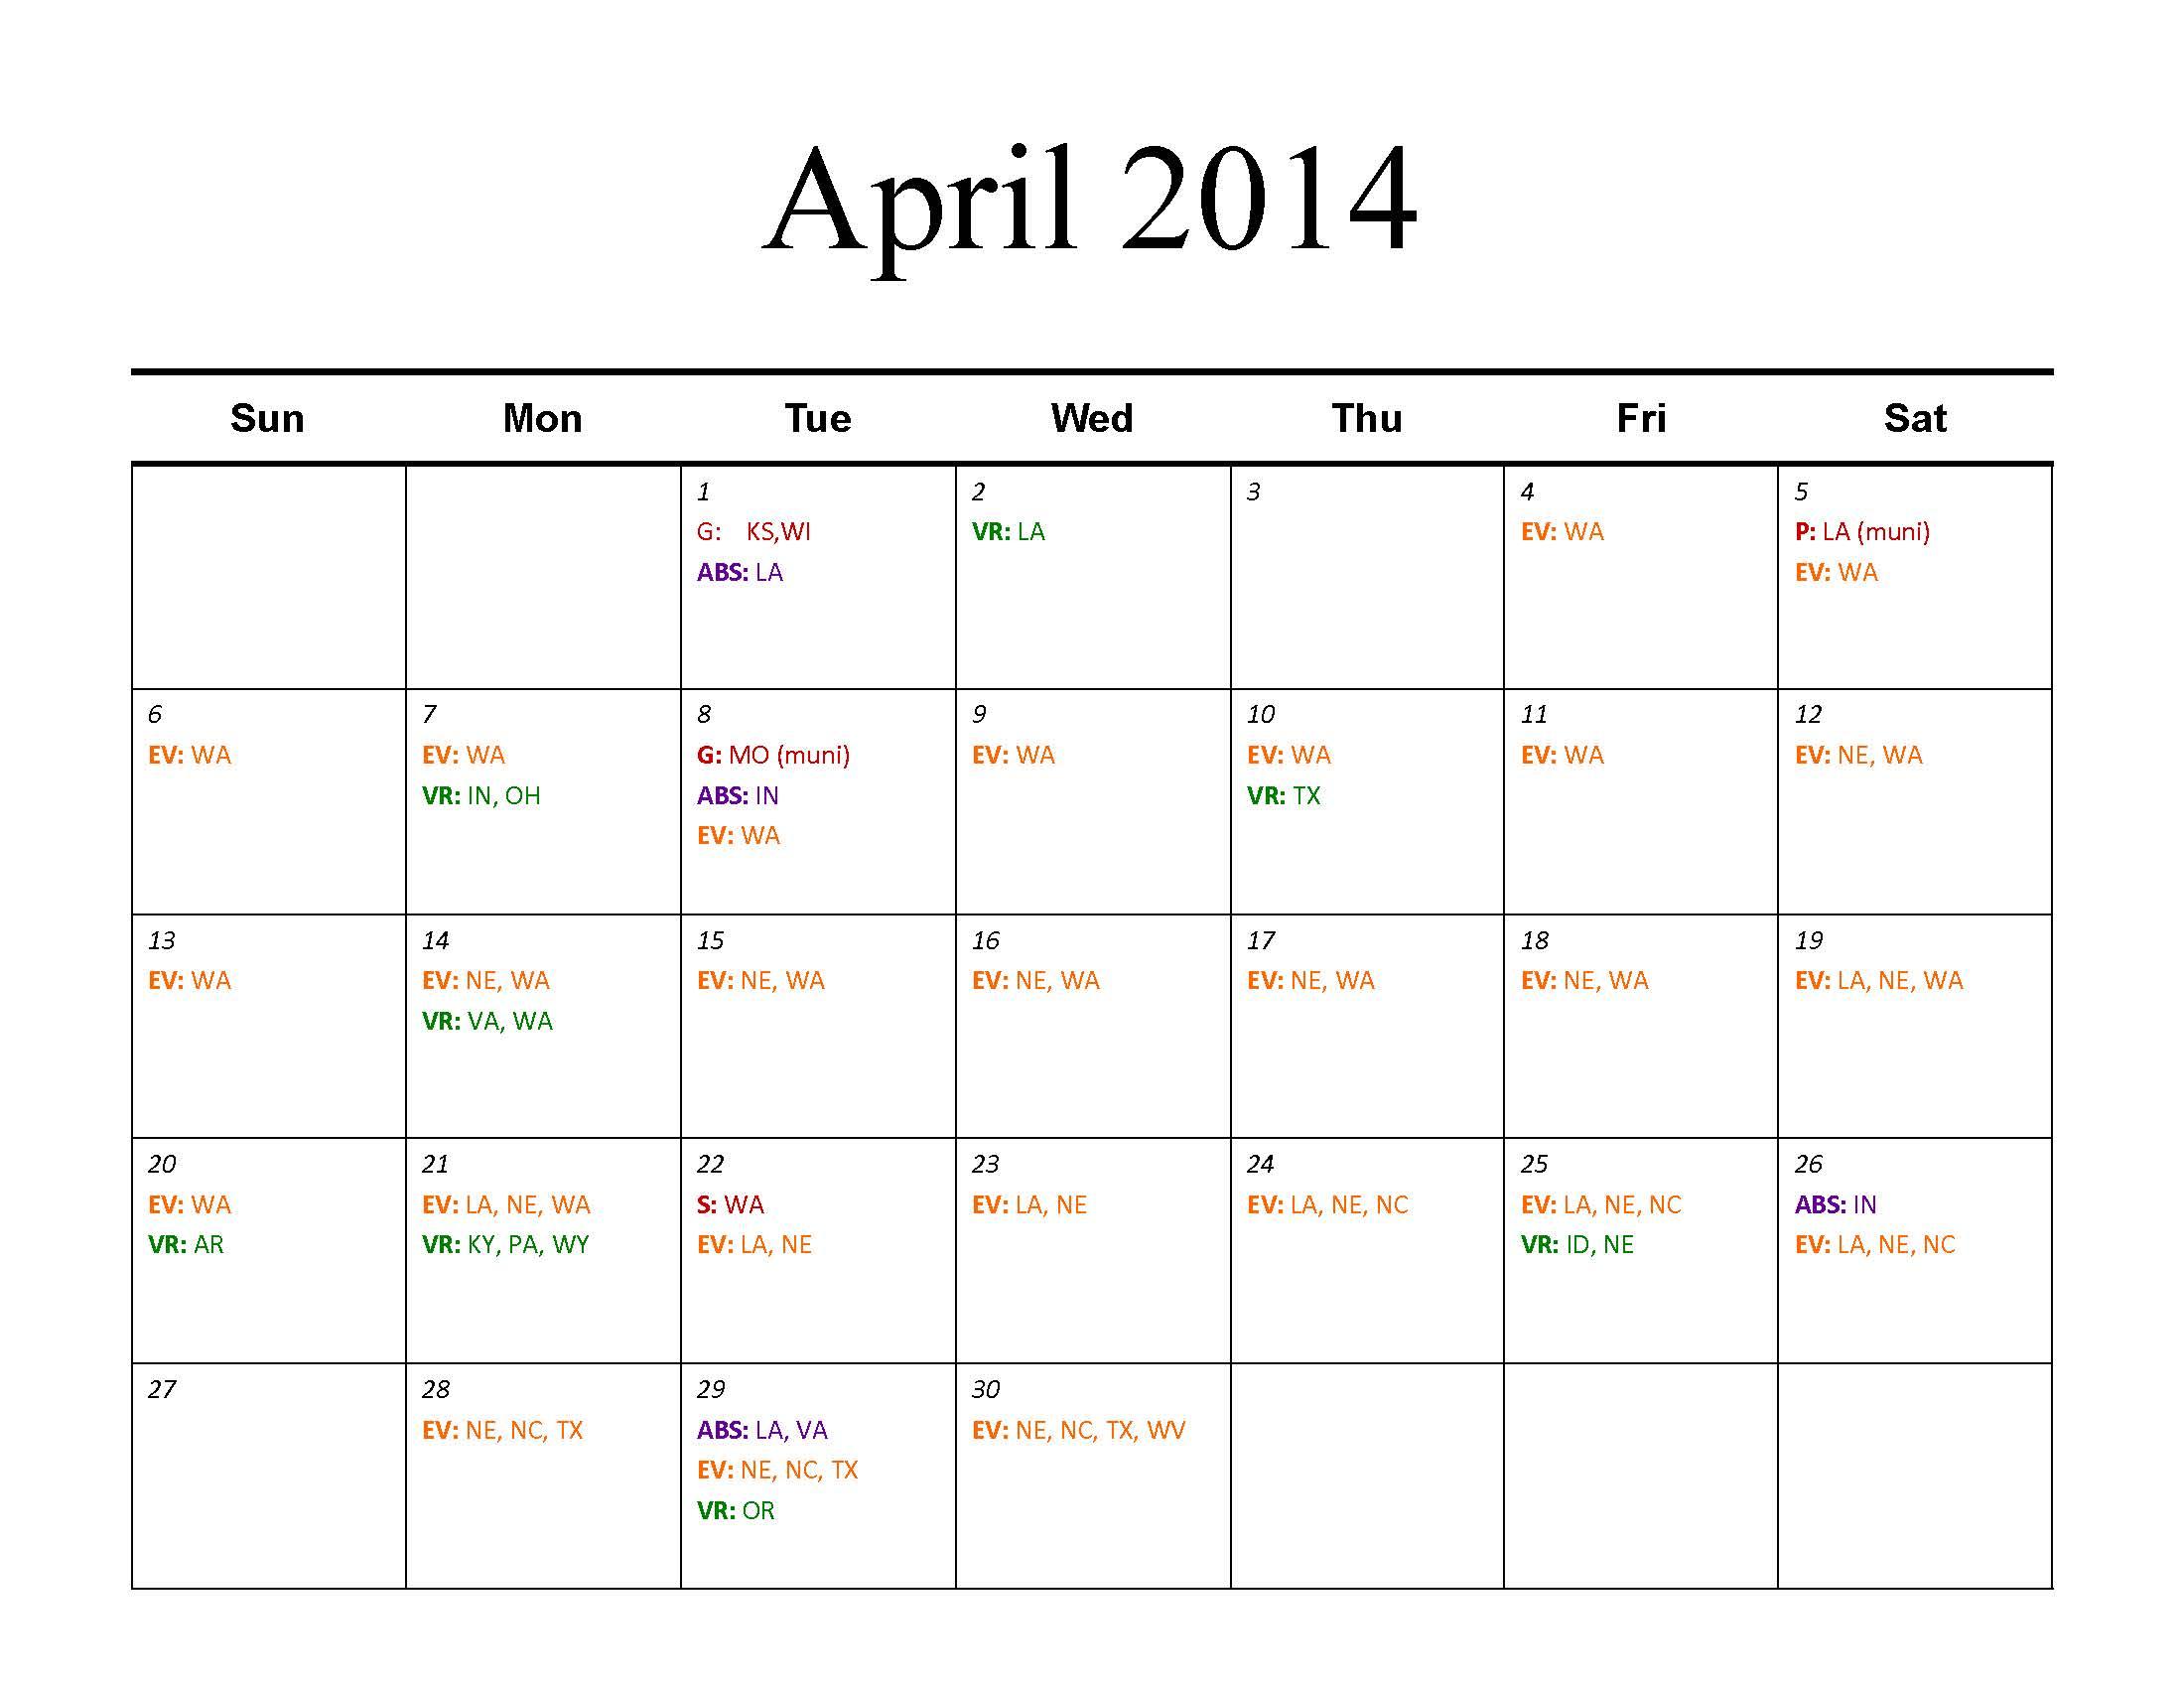 March April May 2014 Calendar April may 2014 calendar ,